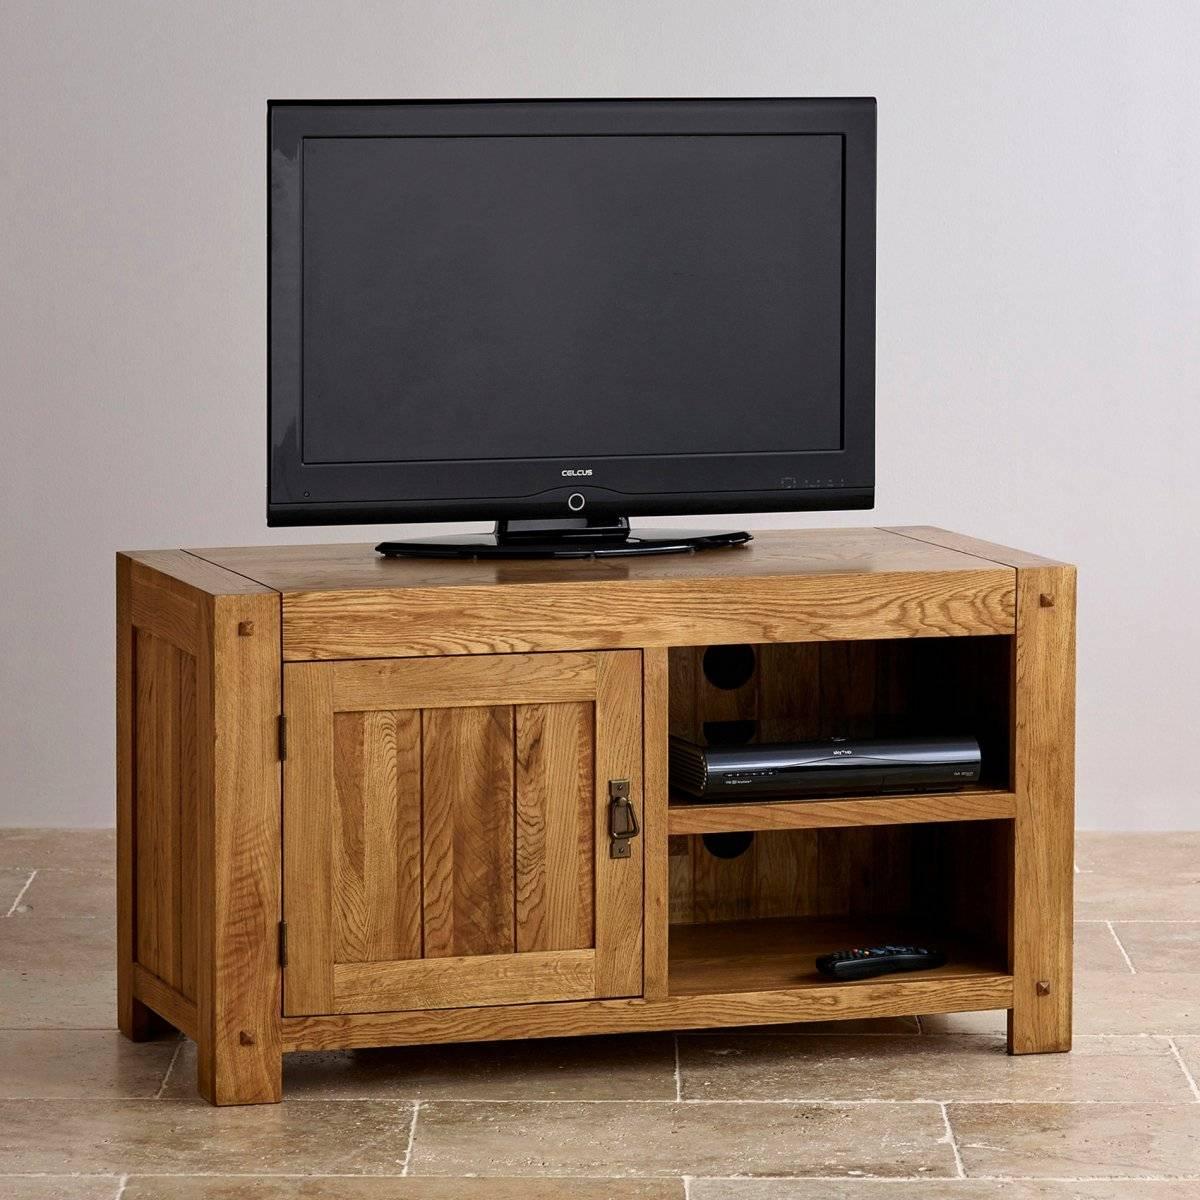 Quercus Tv Cabinet In Rustic Solid Oak | Oak Furniture Land regarding Rustic Oak Tv Stands (Image 8 of 15)